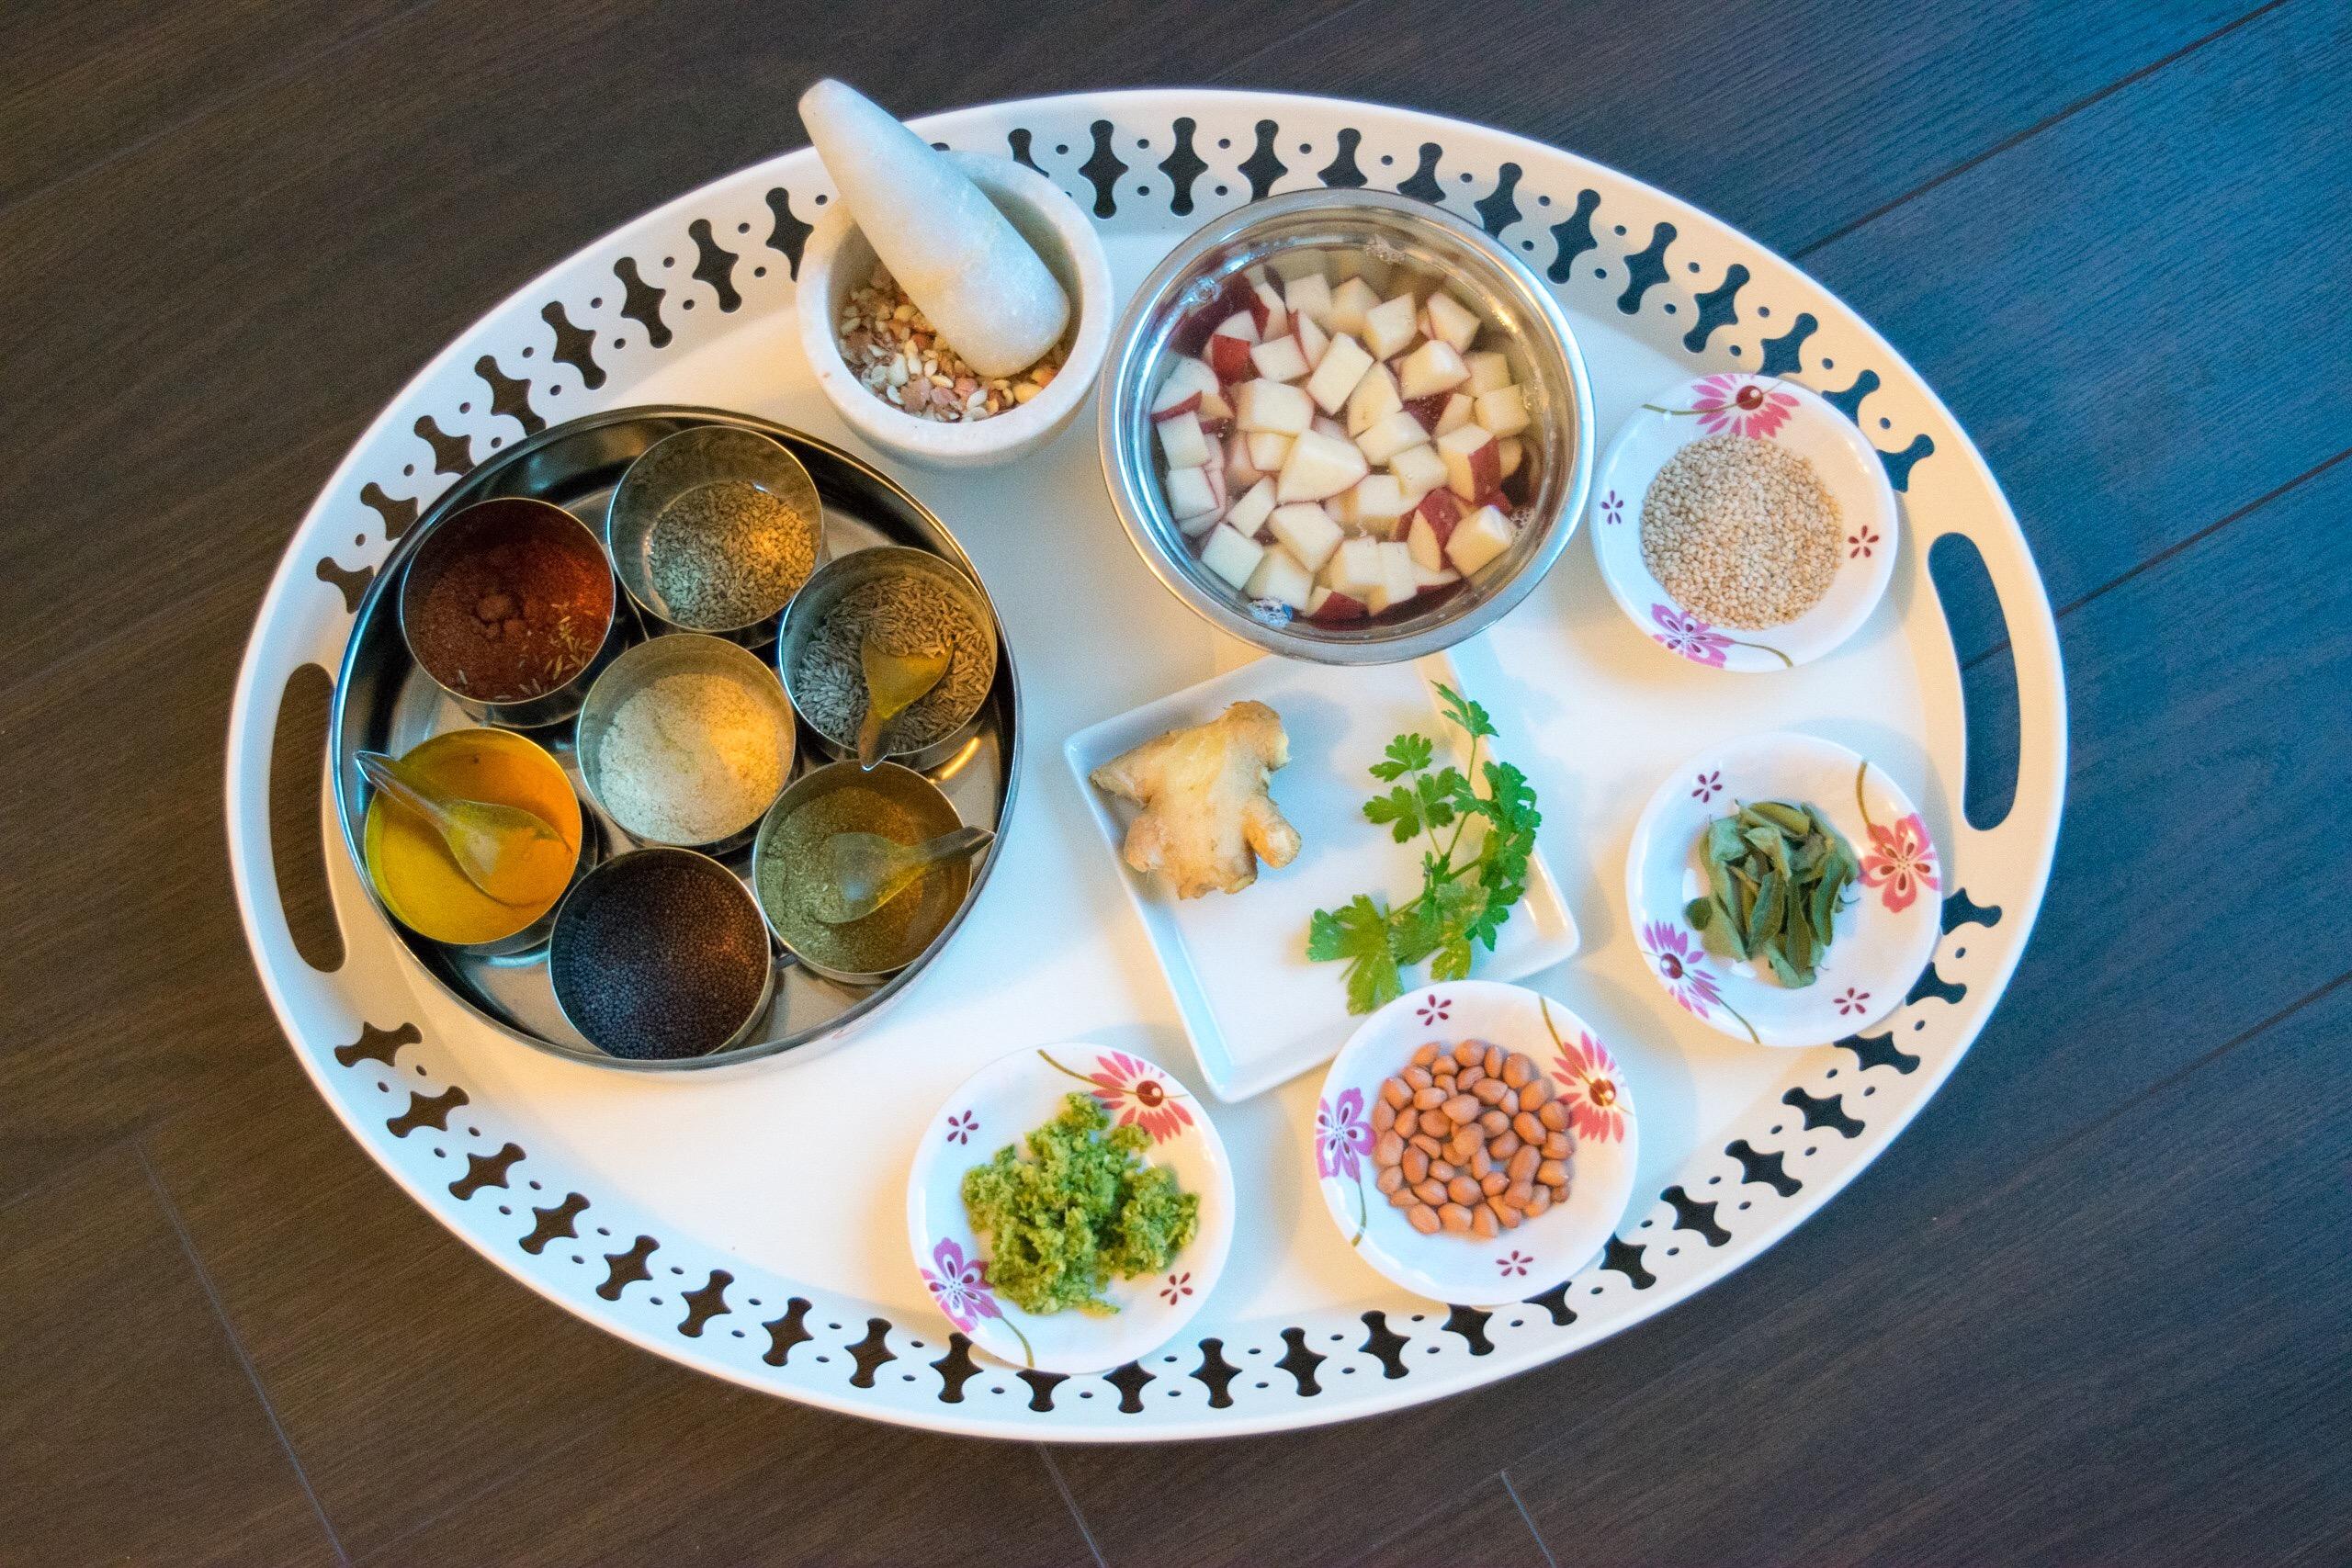 Ingredients Platter